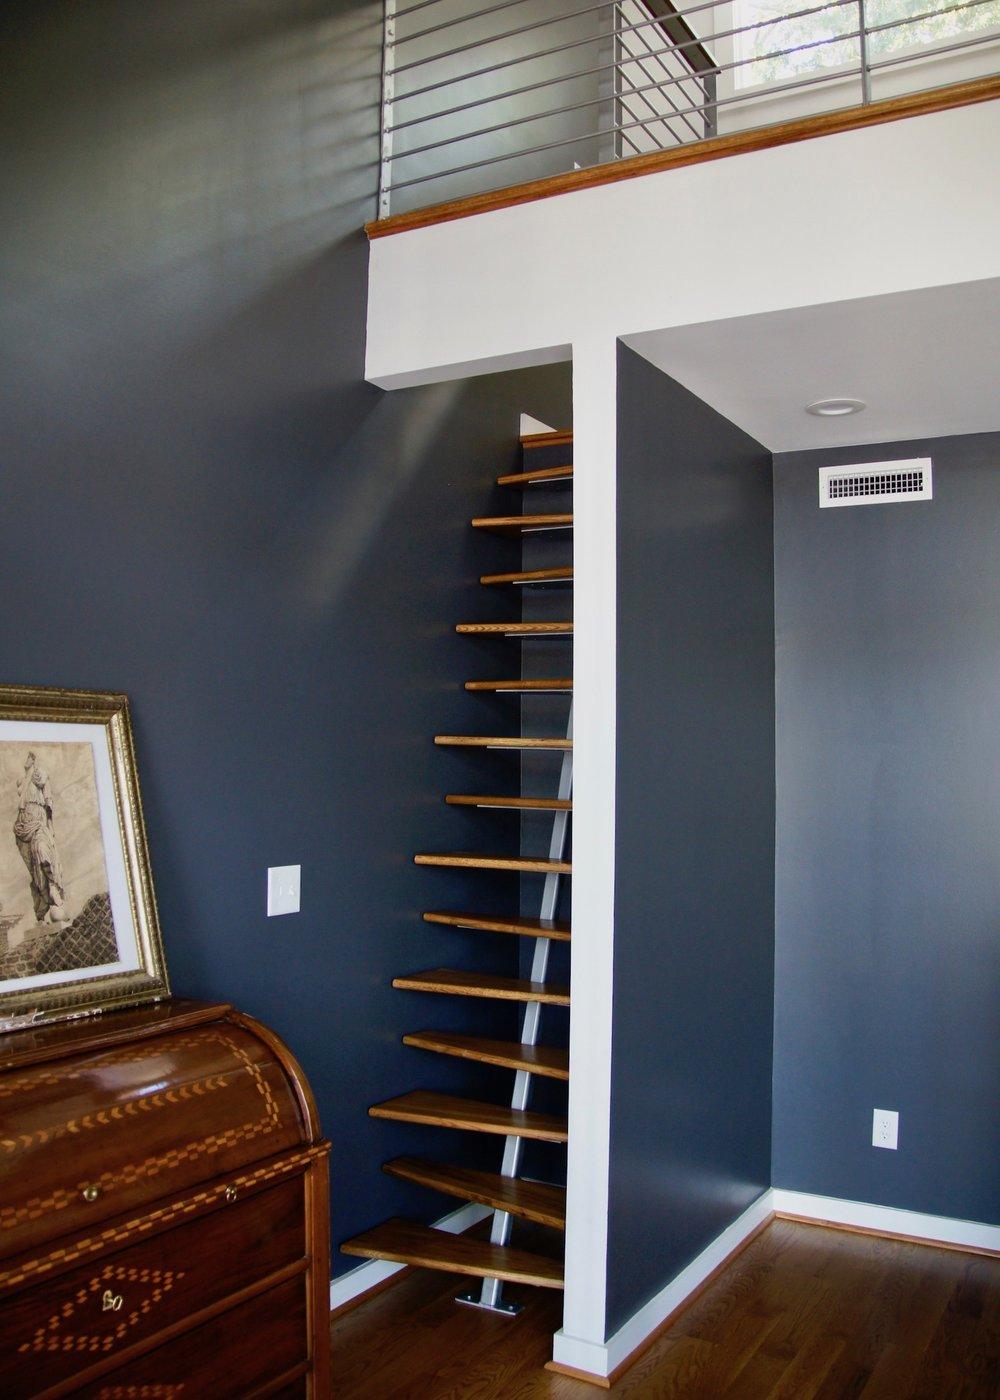 mbedroom ladder.jpg